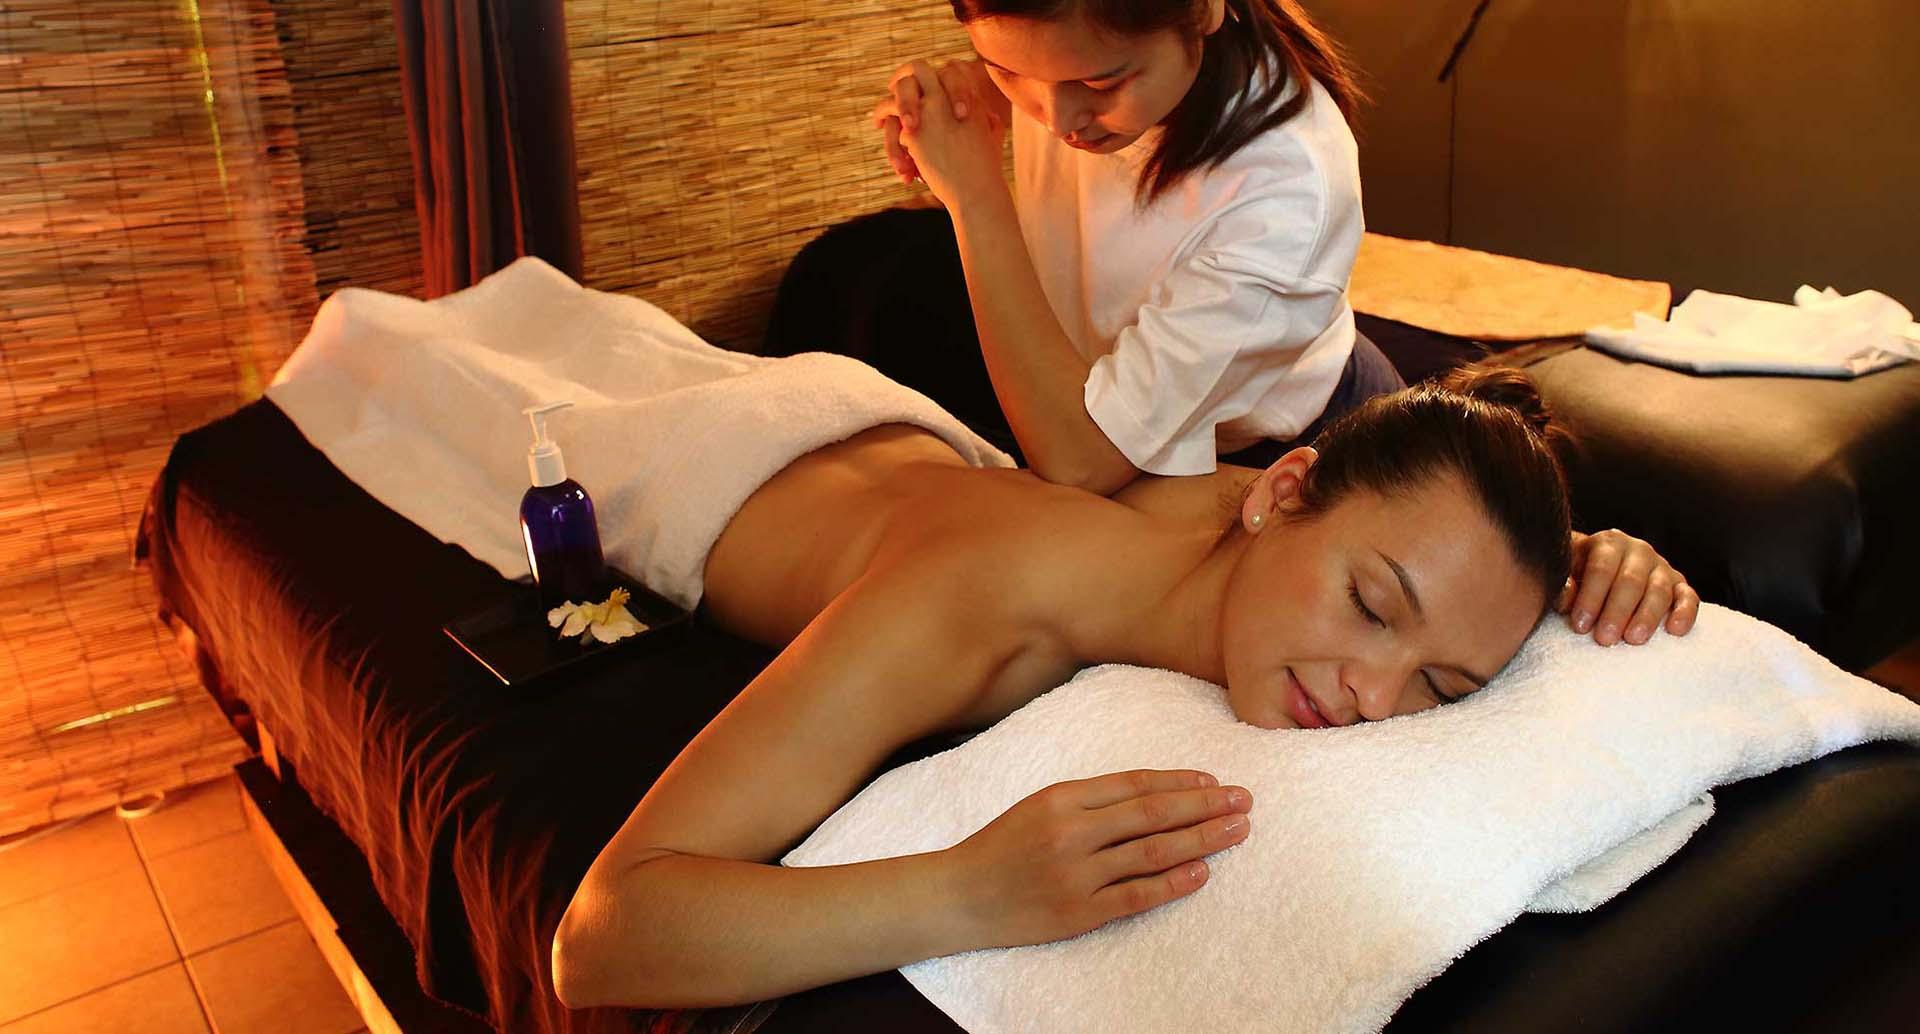 tantra video nuru massage suomi